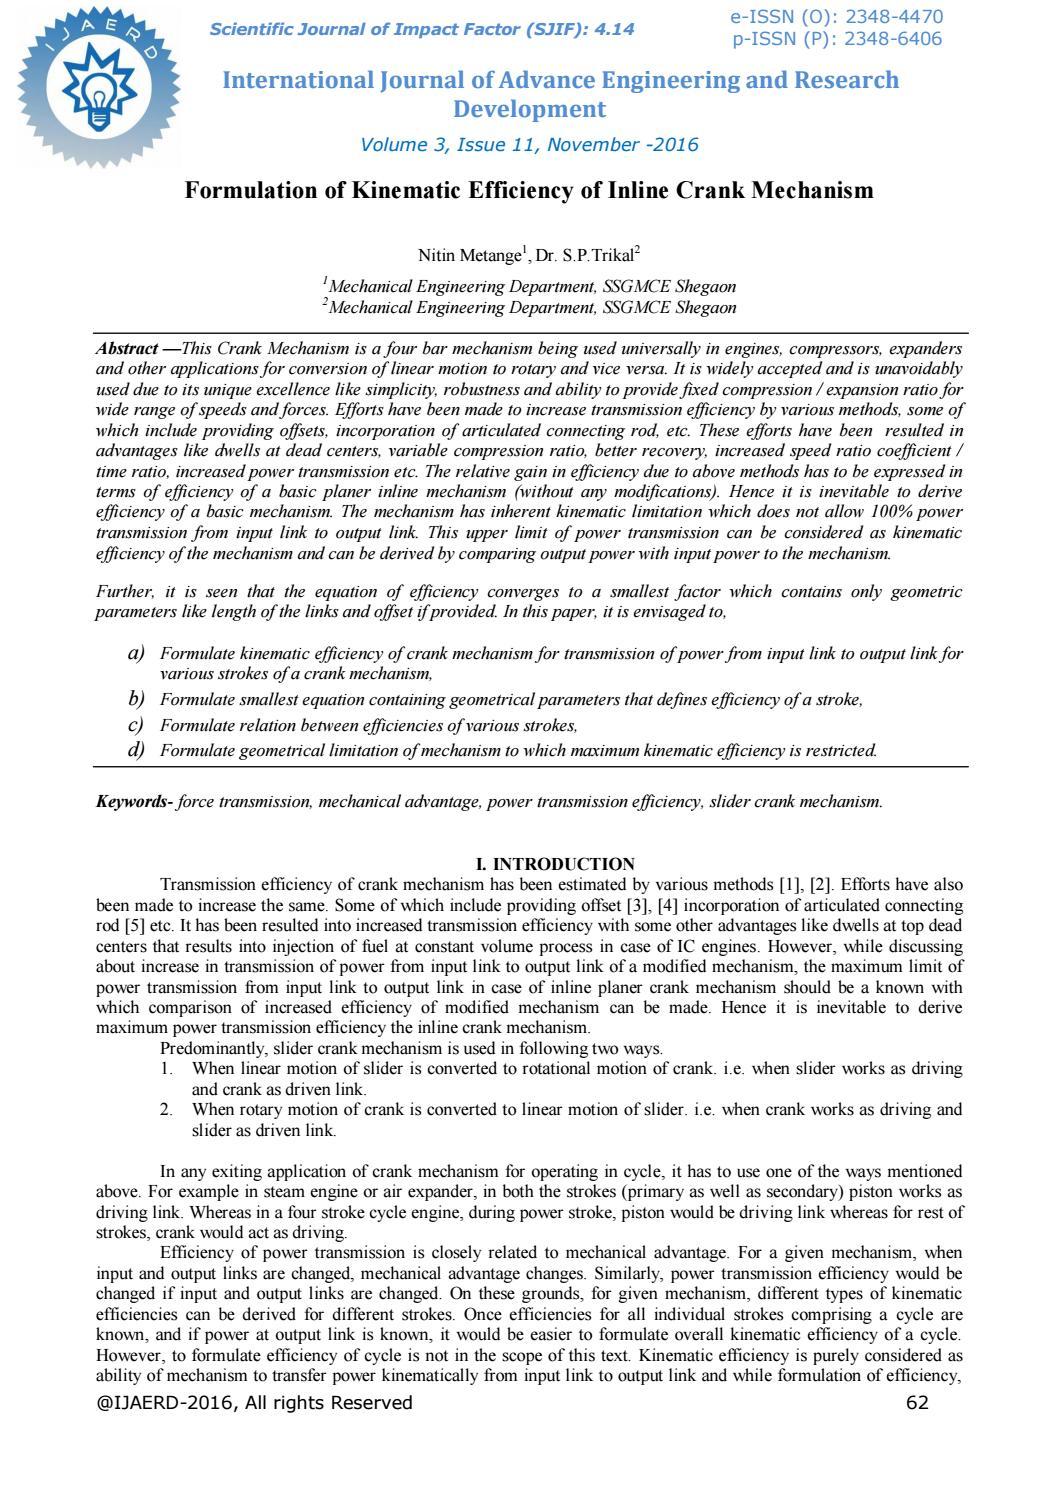 Formulation of kinematic efficiency of inline crank